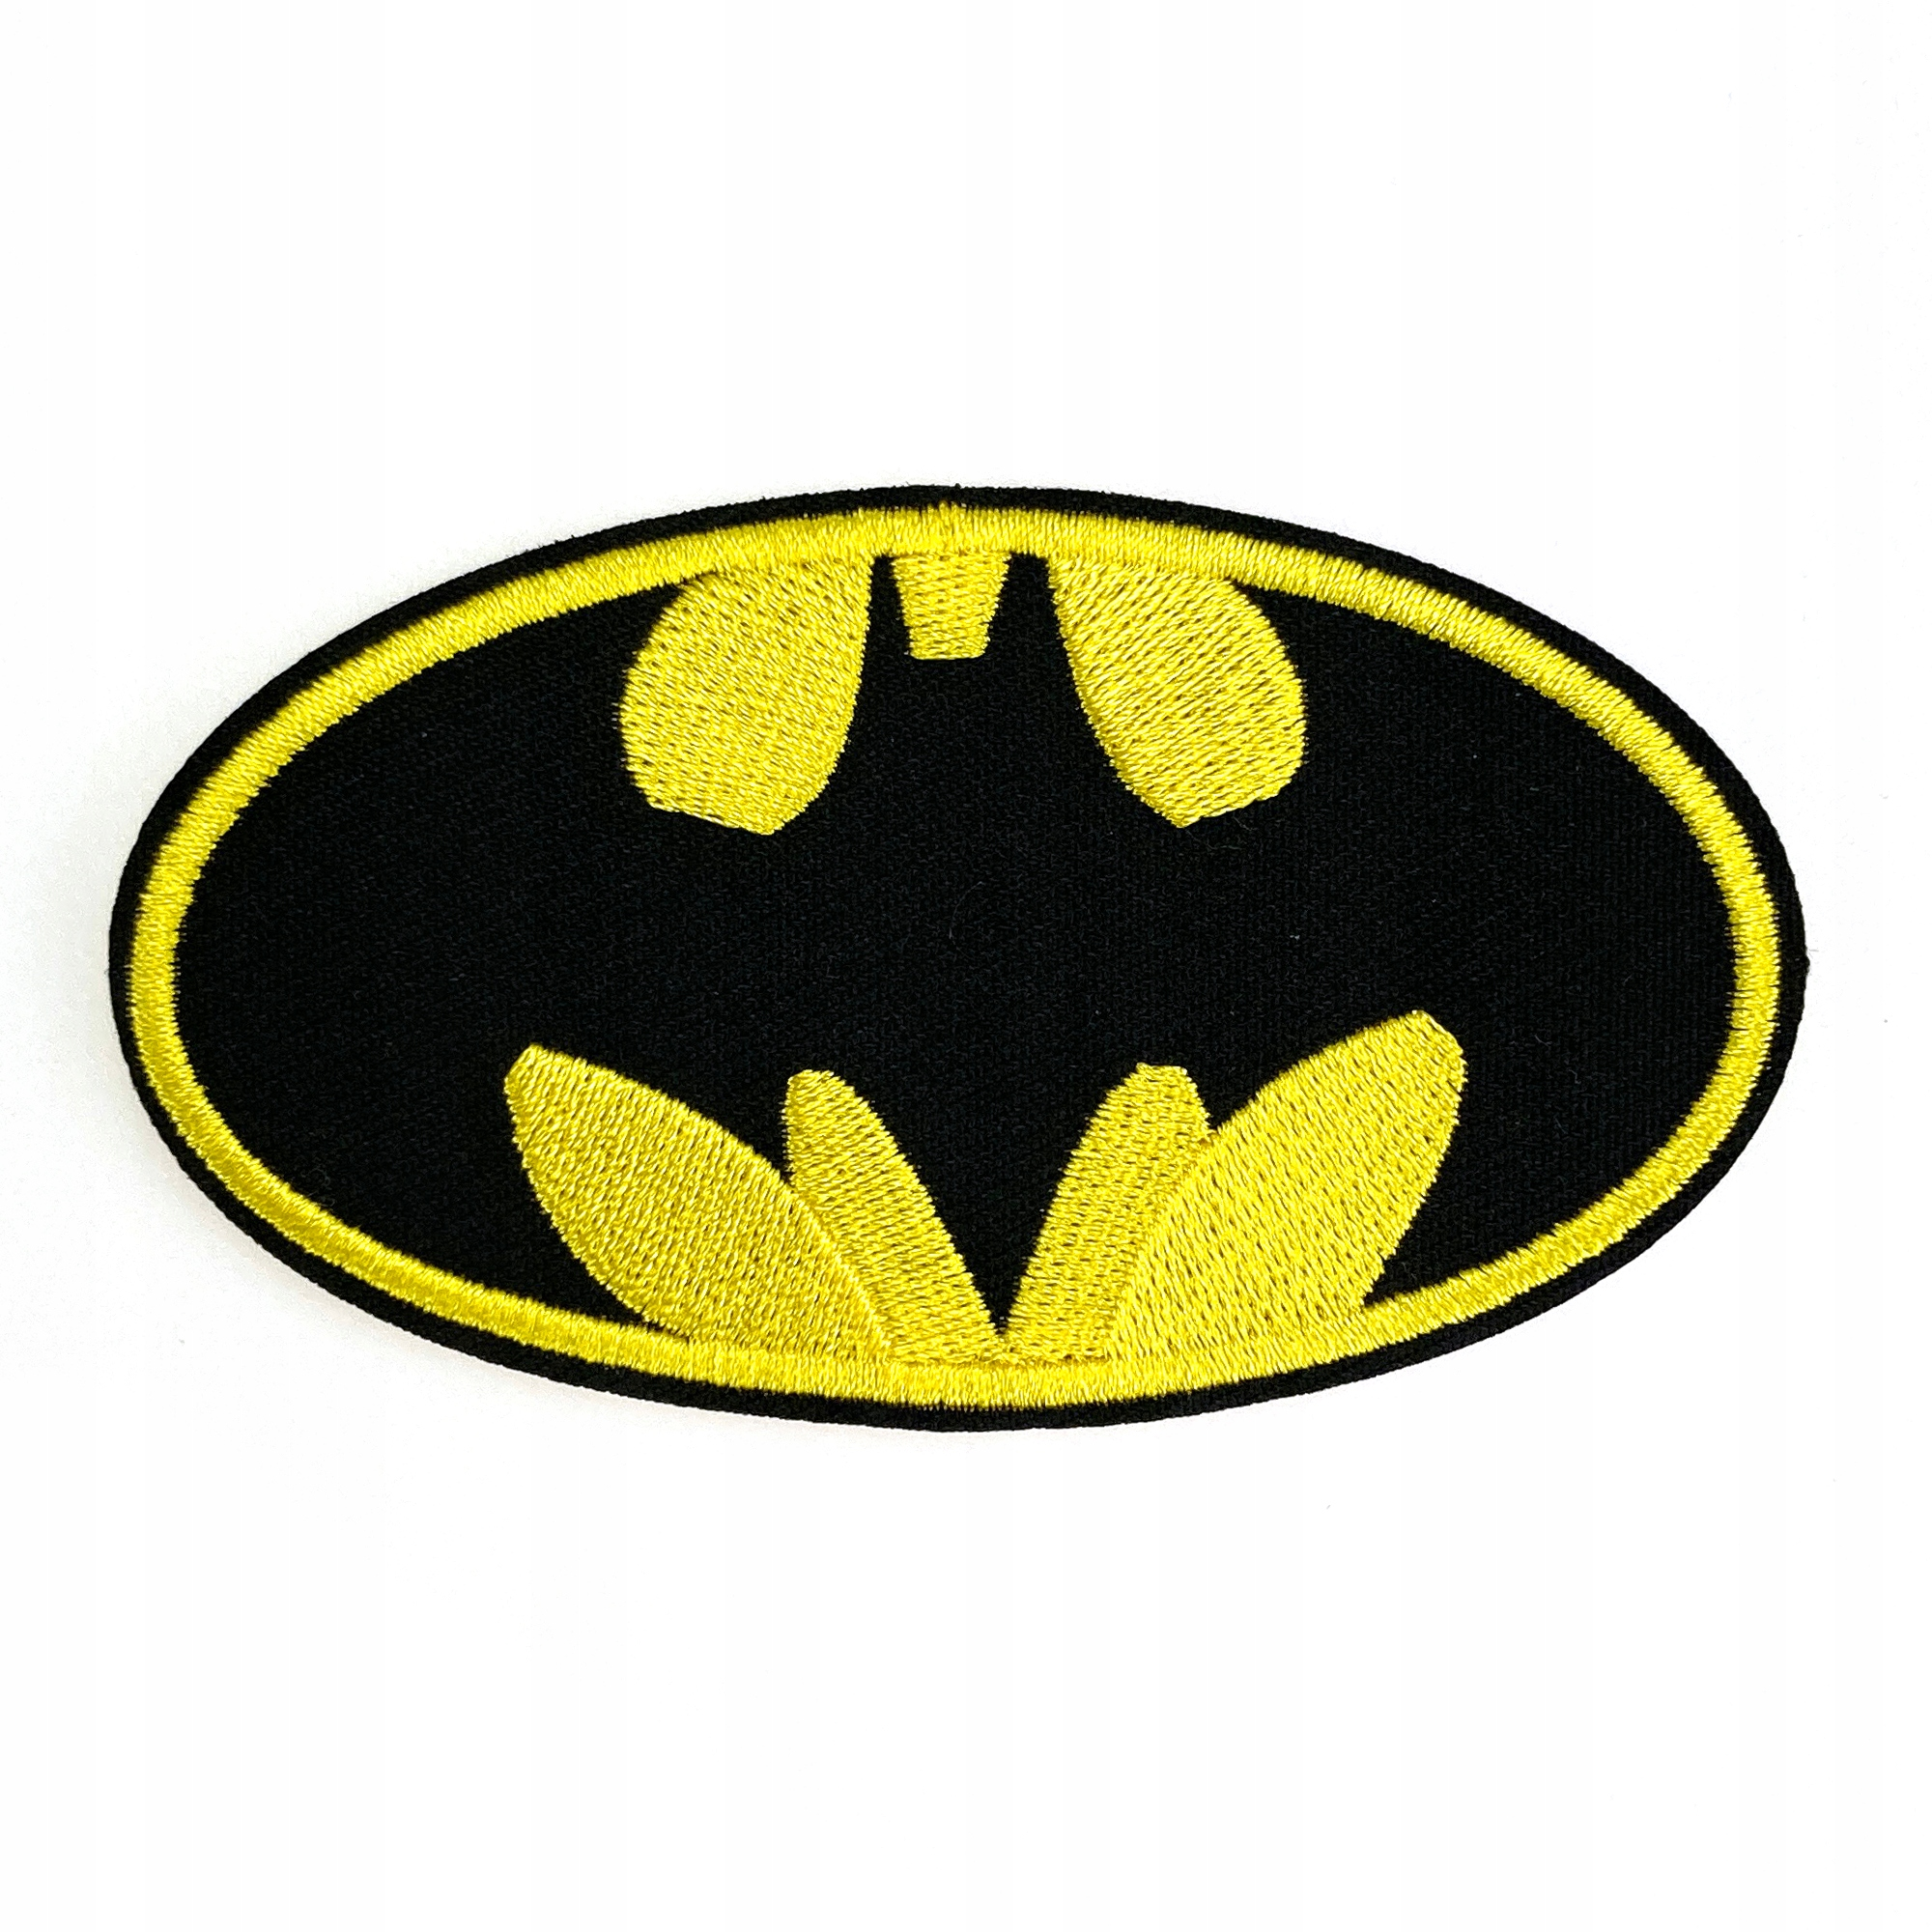 Нашивка TERMO, утюг с тиснением Бэтмен с логотипом мстителей